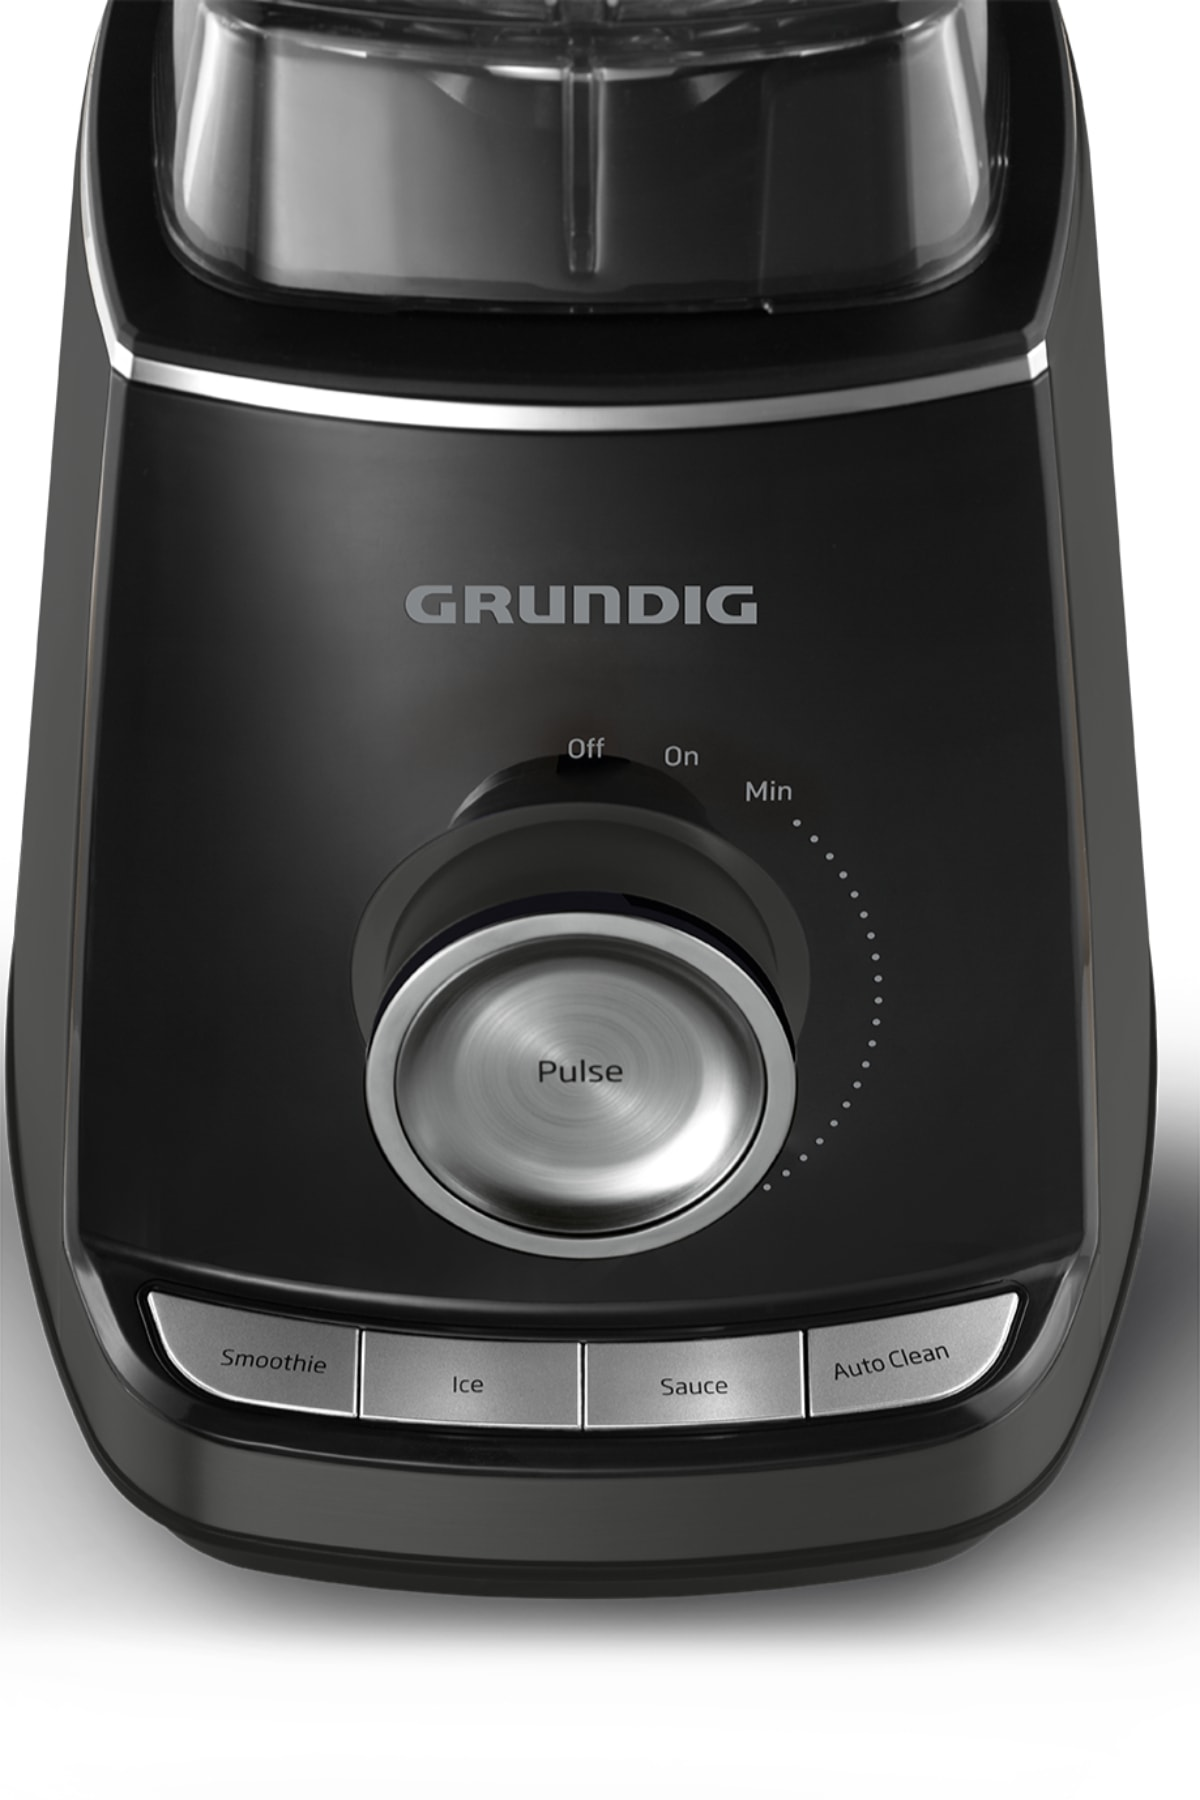 Grundig PB 8760 Professional Line Power Blender / 1600 Watt 2